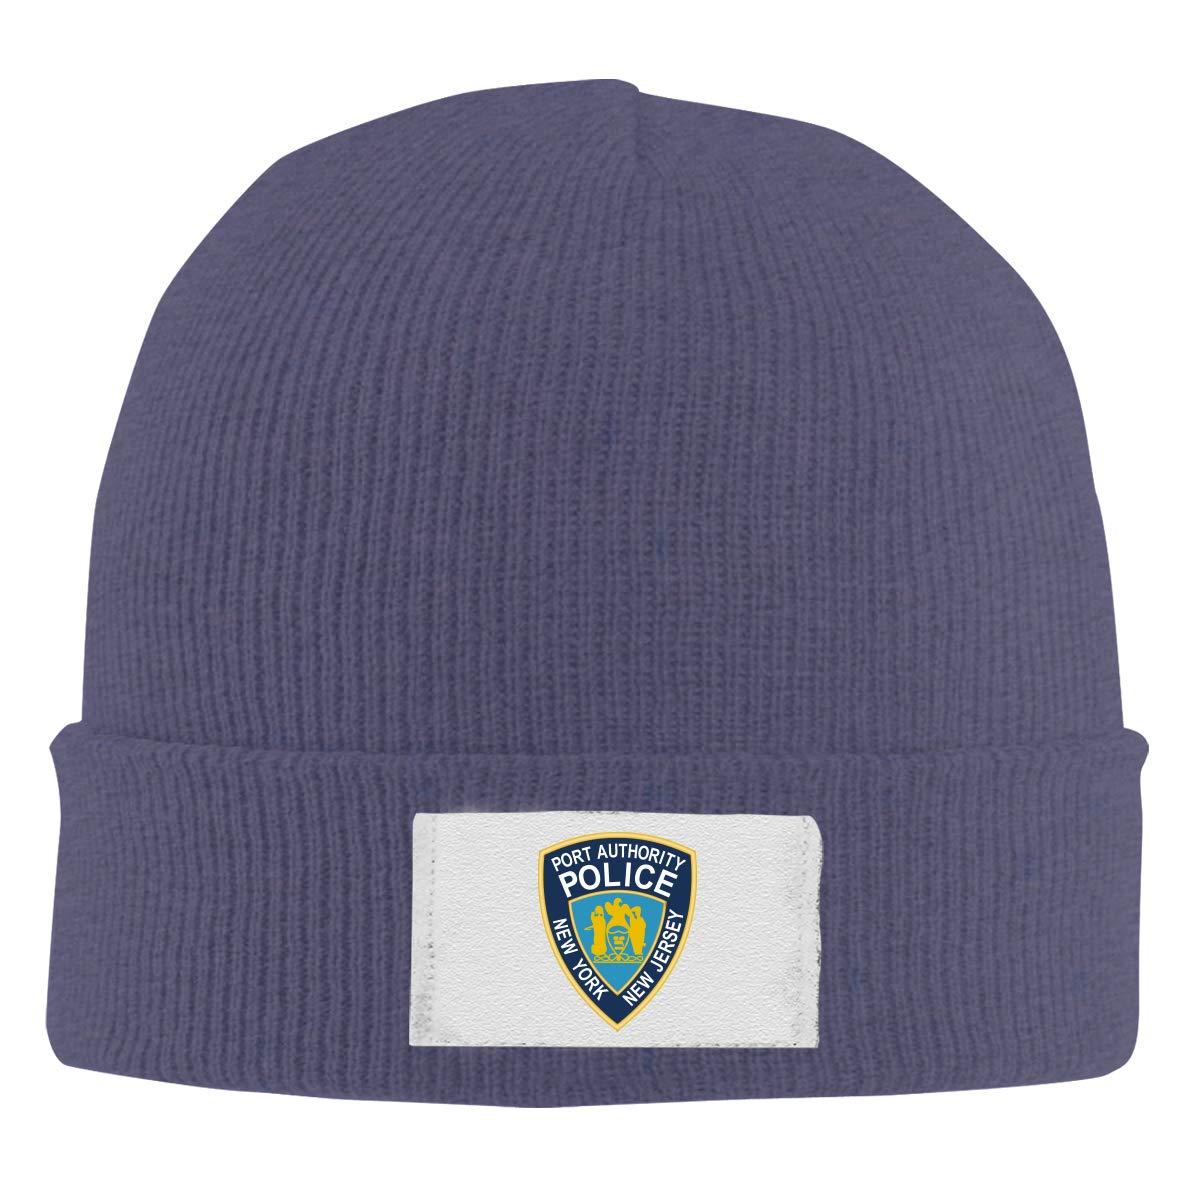 Stretchy Cuff Beanie Hat Black Dunpaiaa Skull Caps New Jersey State Police Logo Winter Warm Knit Hats